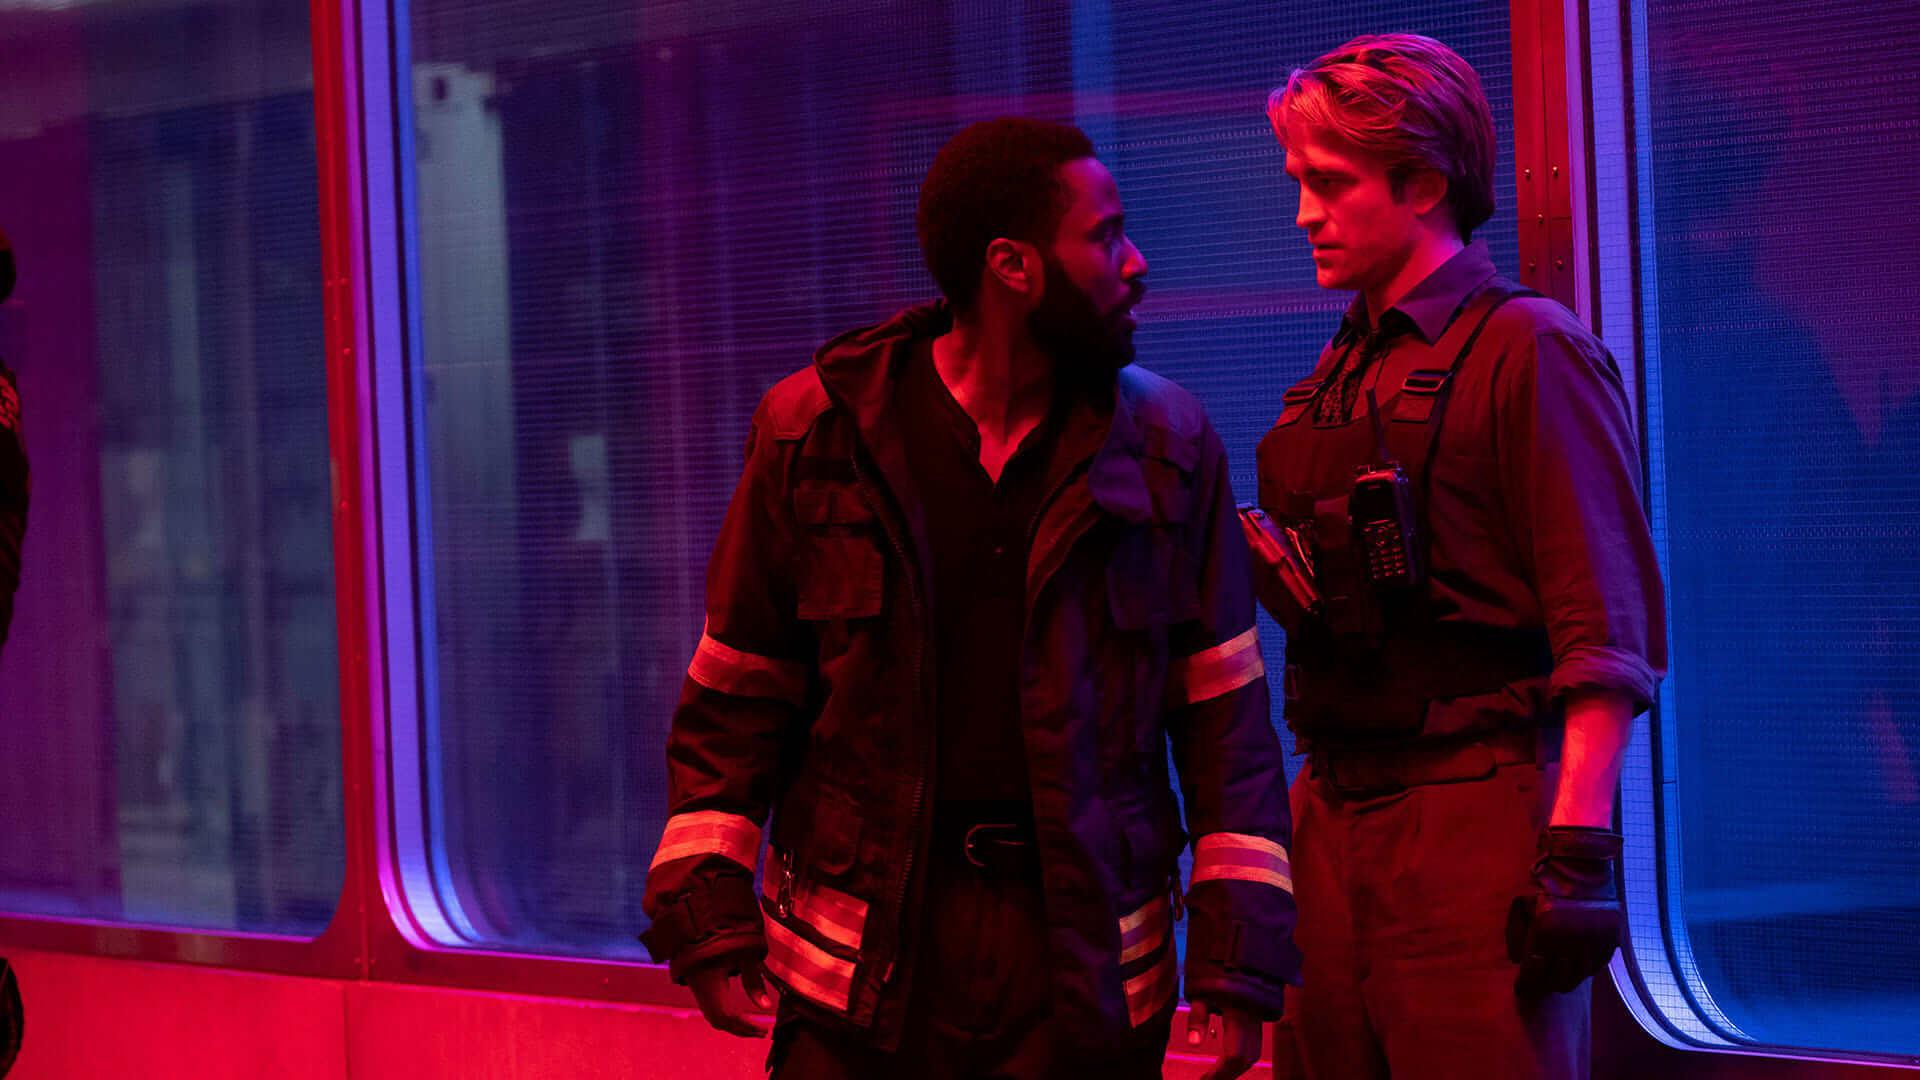 Tenet (2020) Still of John David Washington and Robert Pattinson